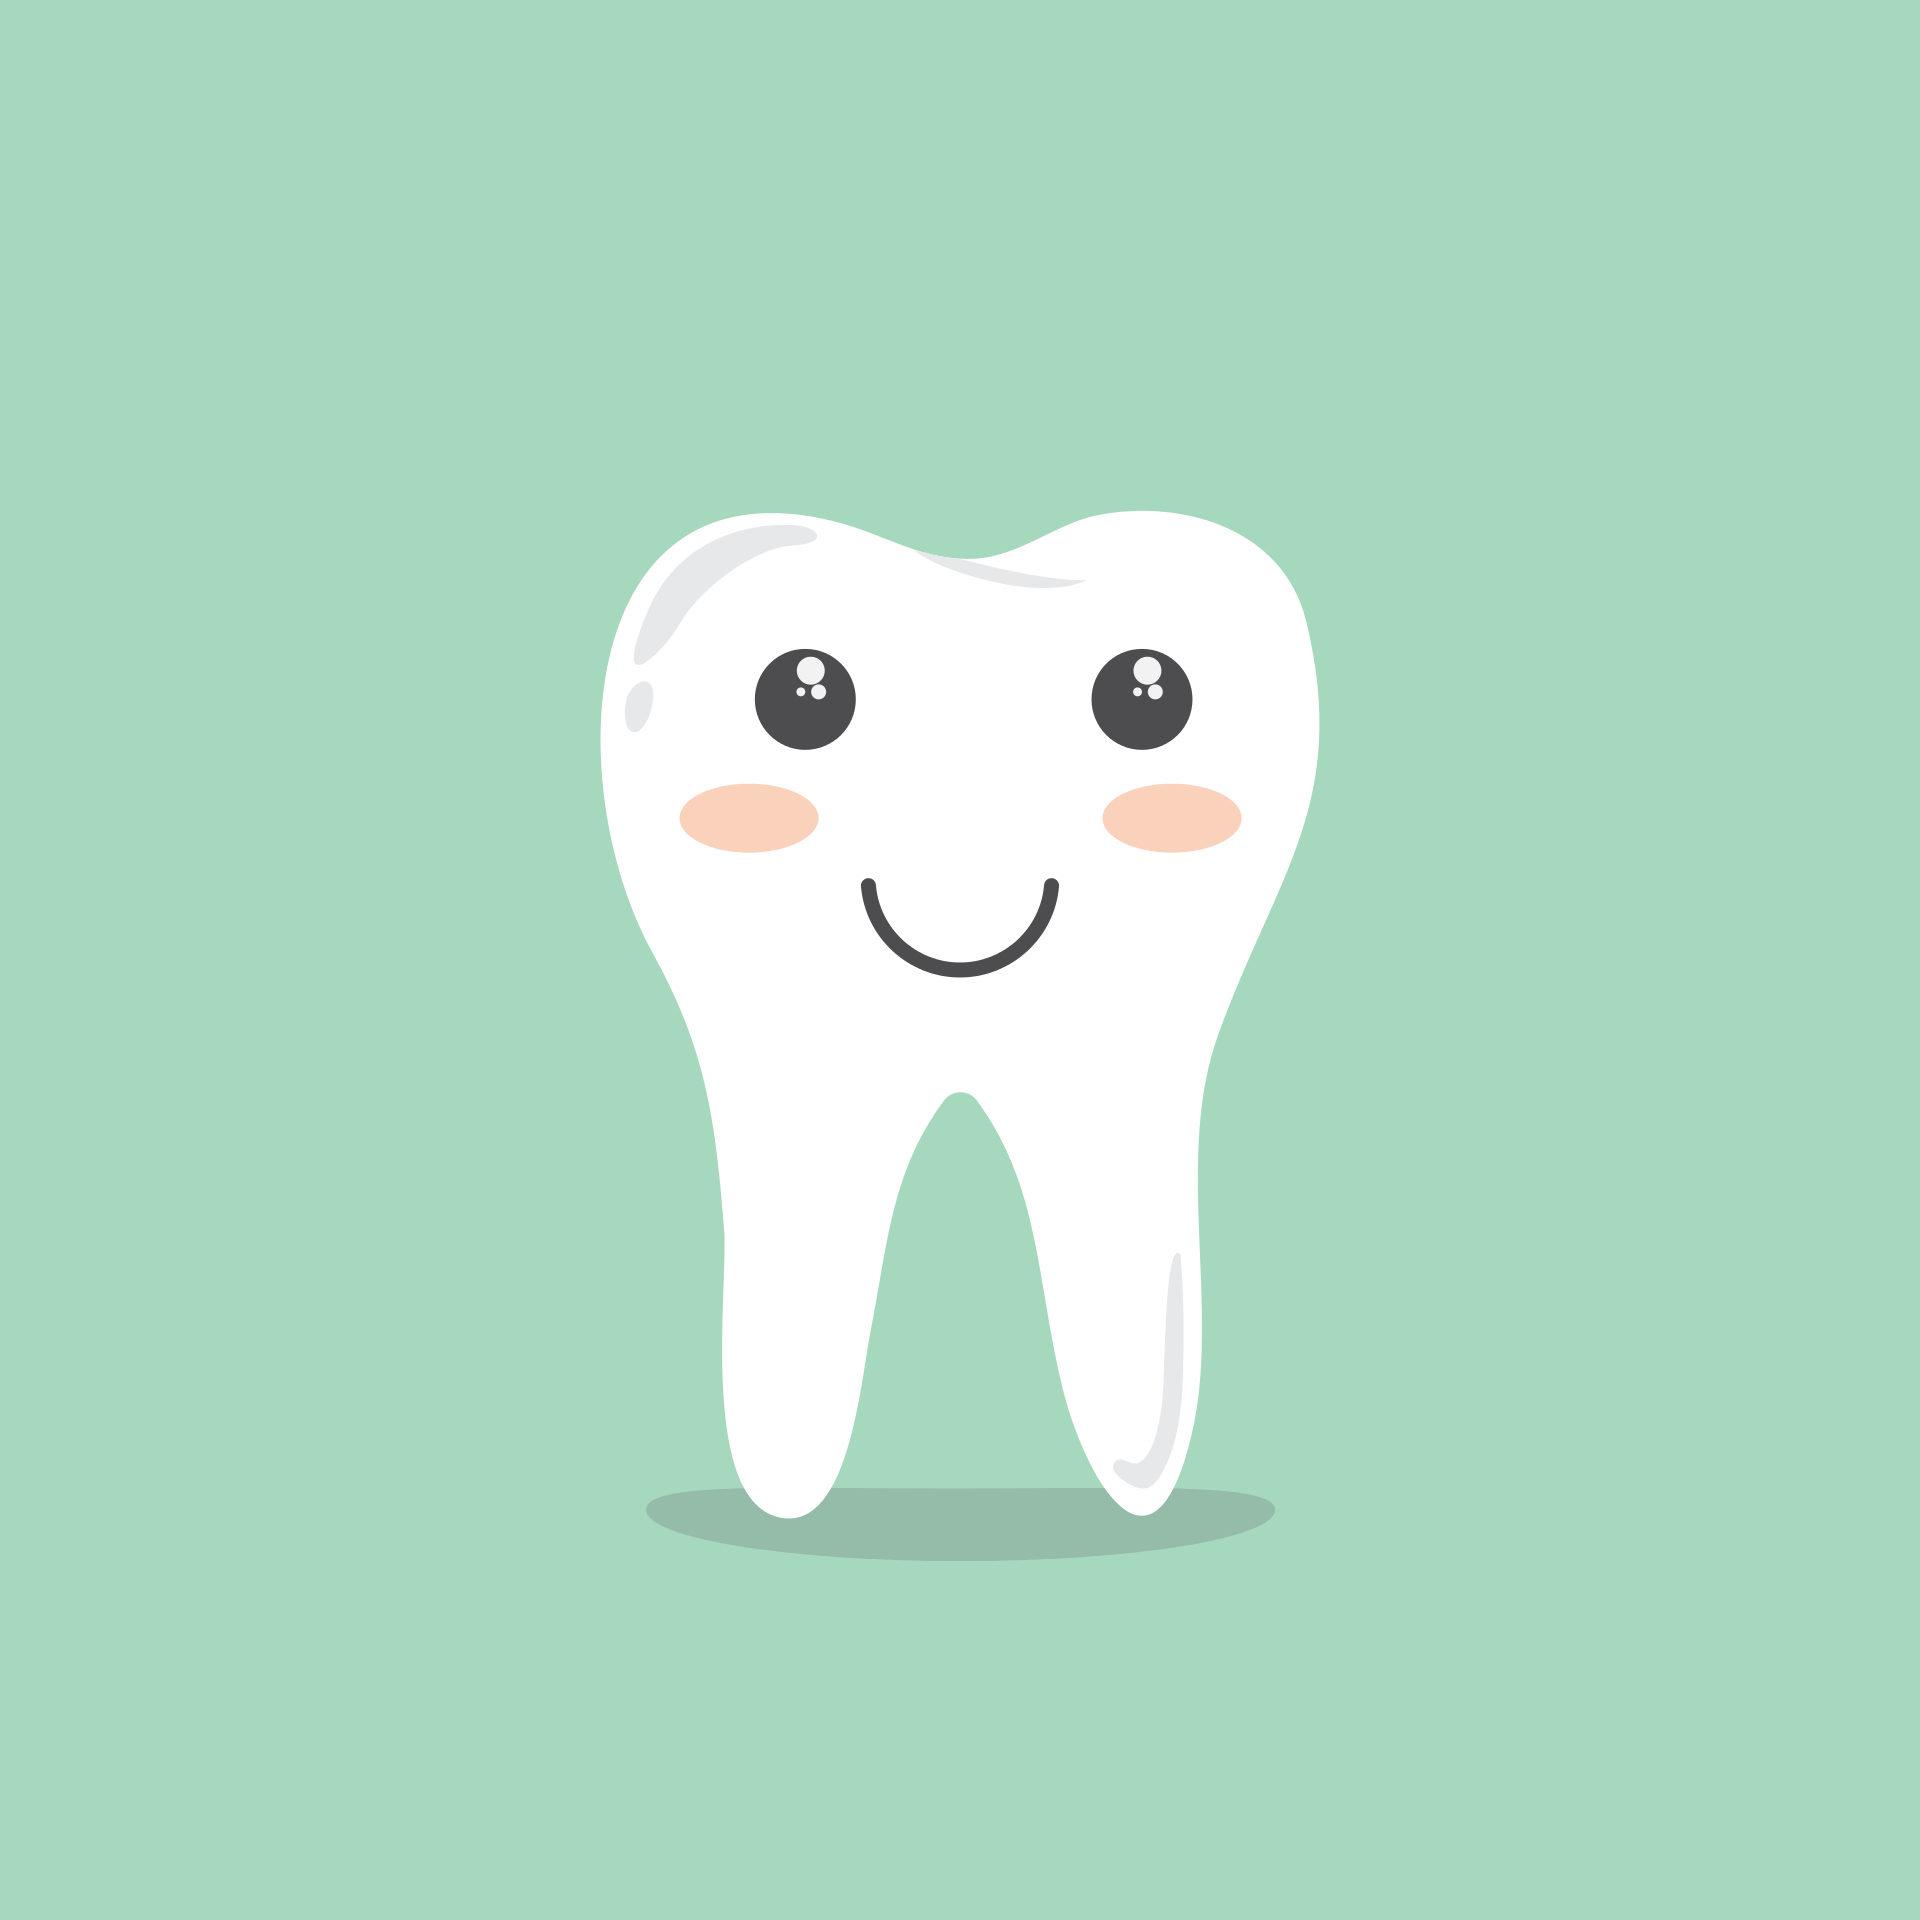 dente, sorriso, occhi, Mola abrasiva, fumetto - Sfondi HD - Professor-falken.com